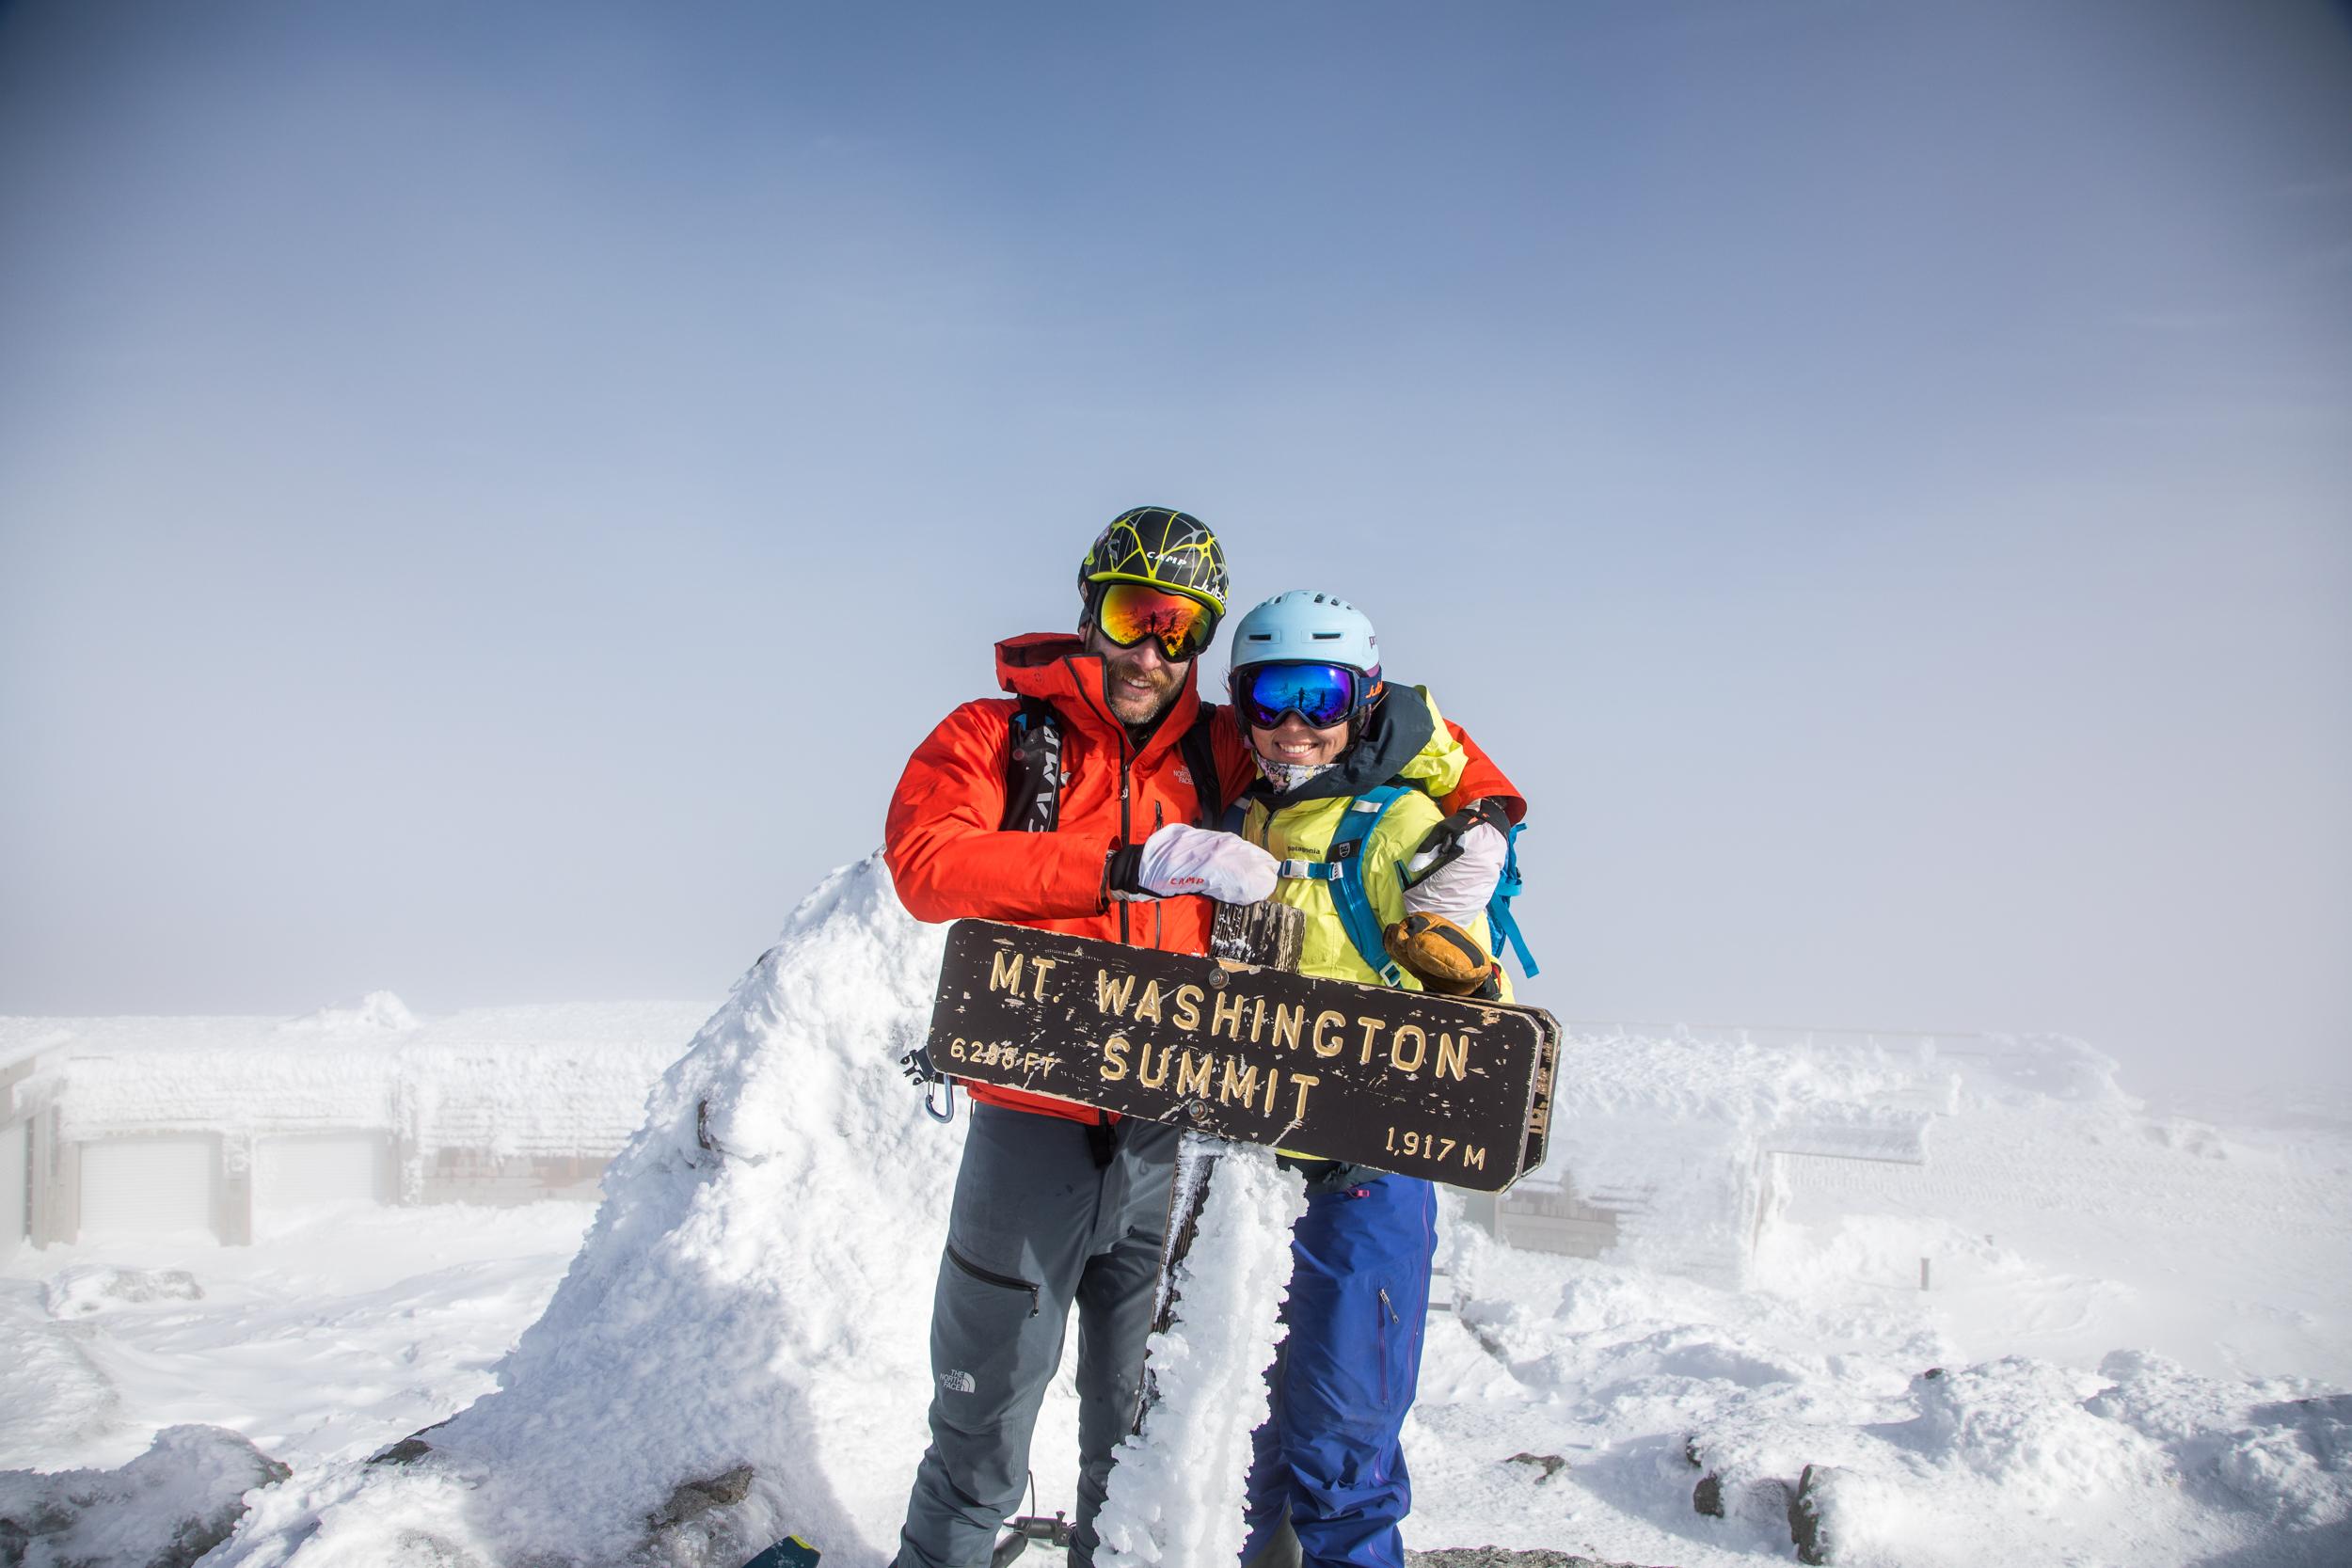 Andrew Drummond Hilary McCloy Summit Mount Washington.jpg